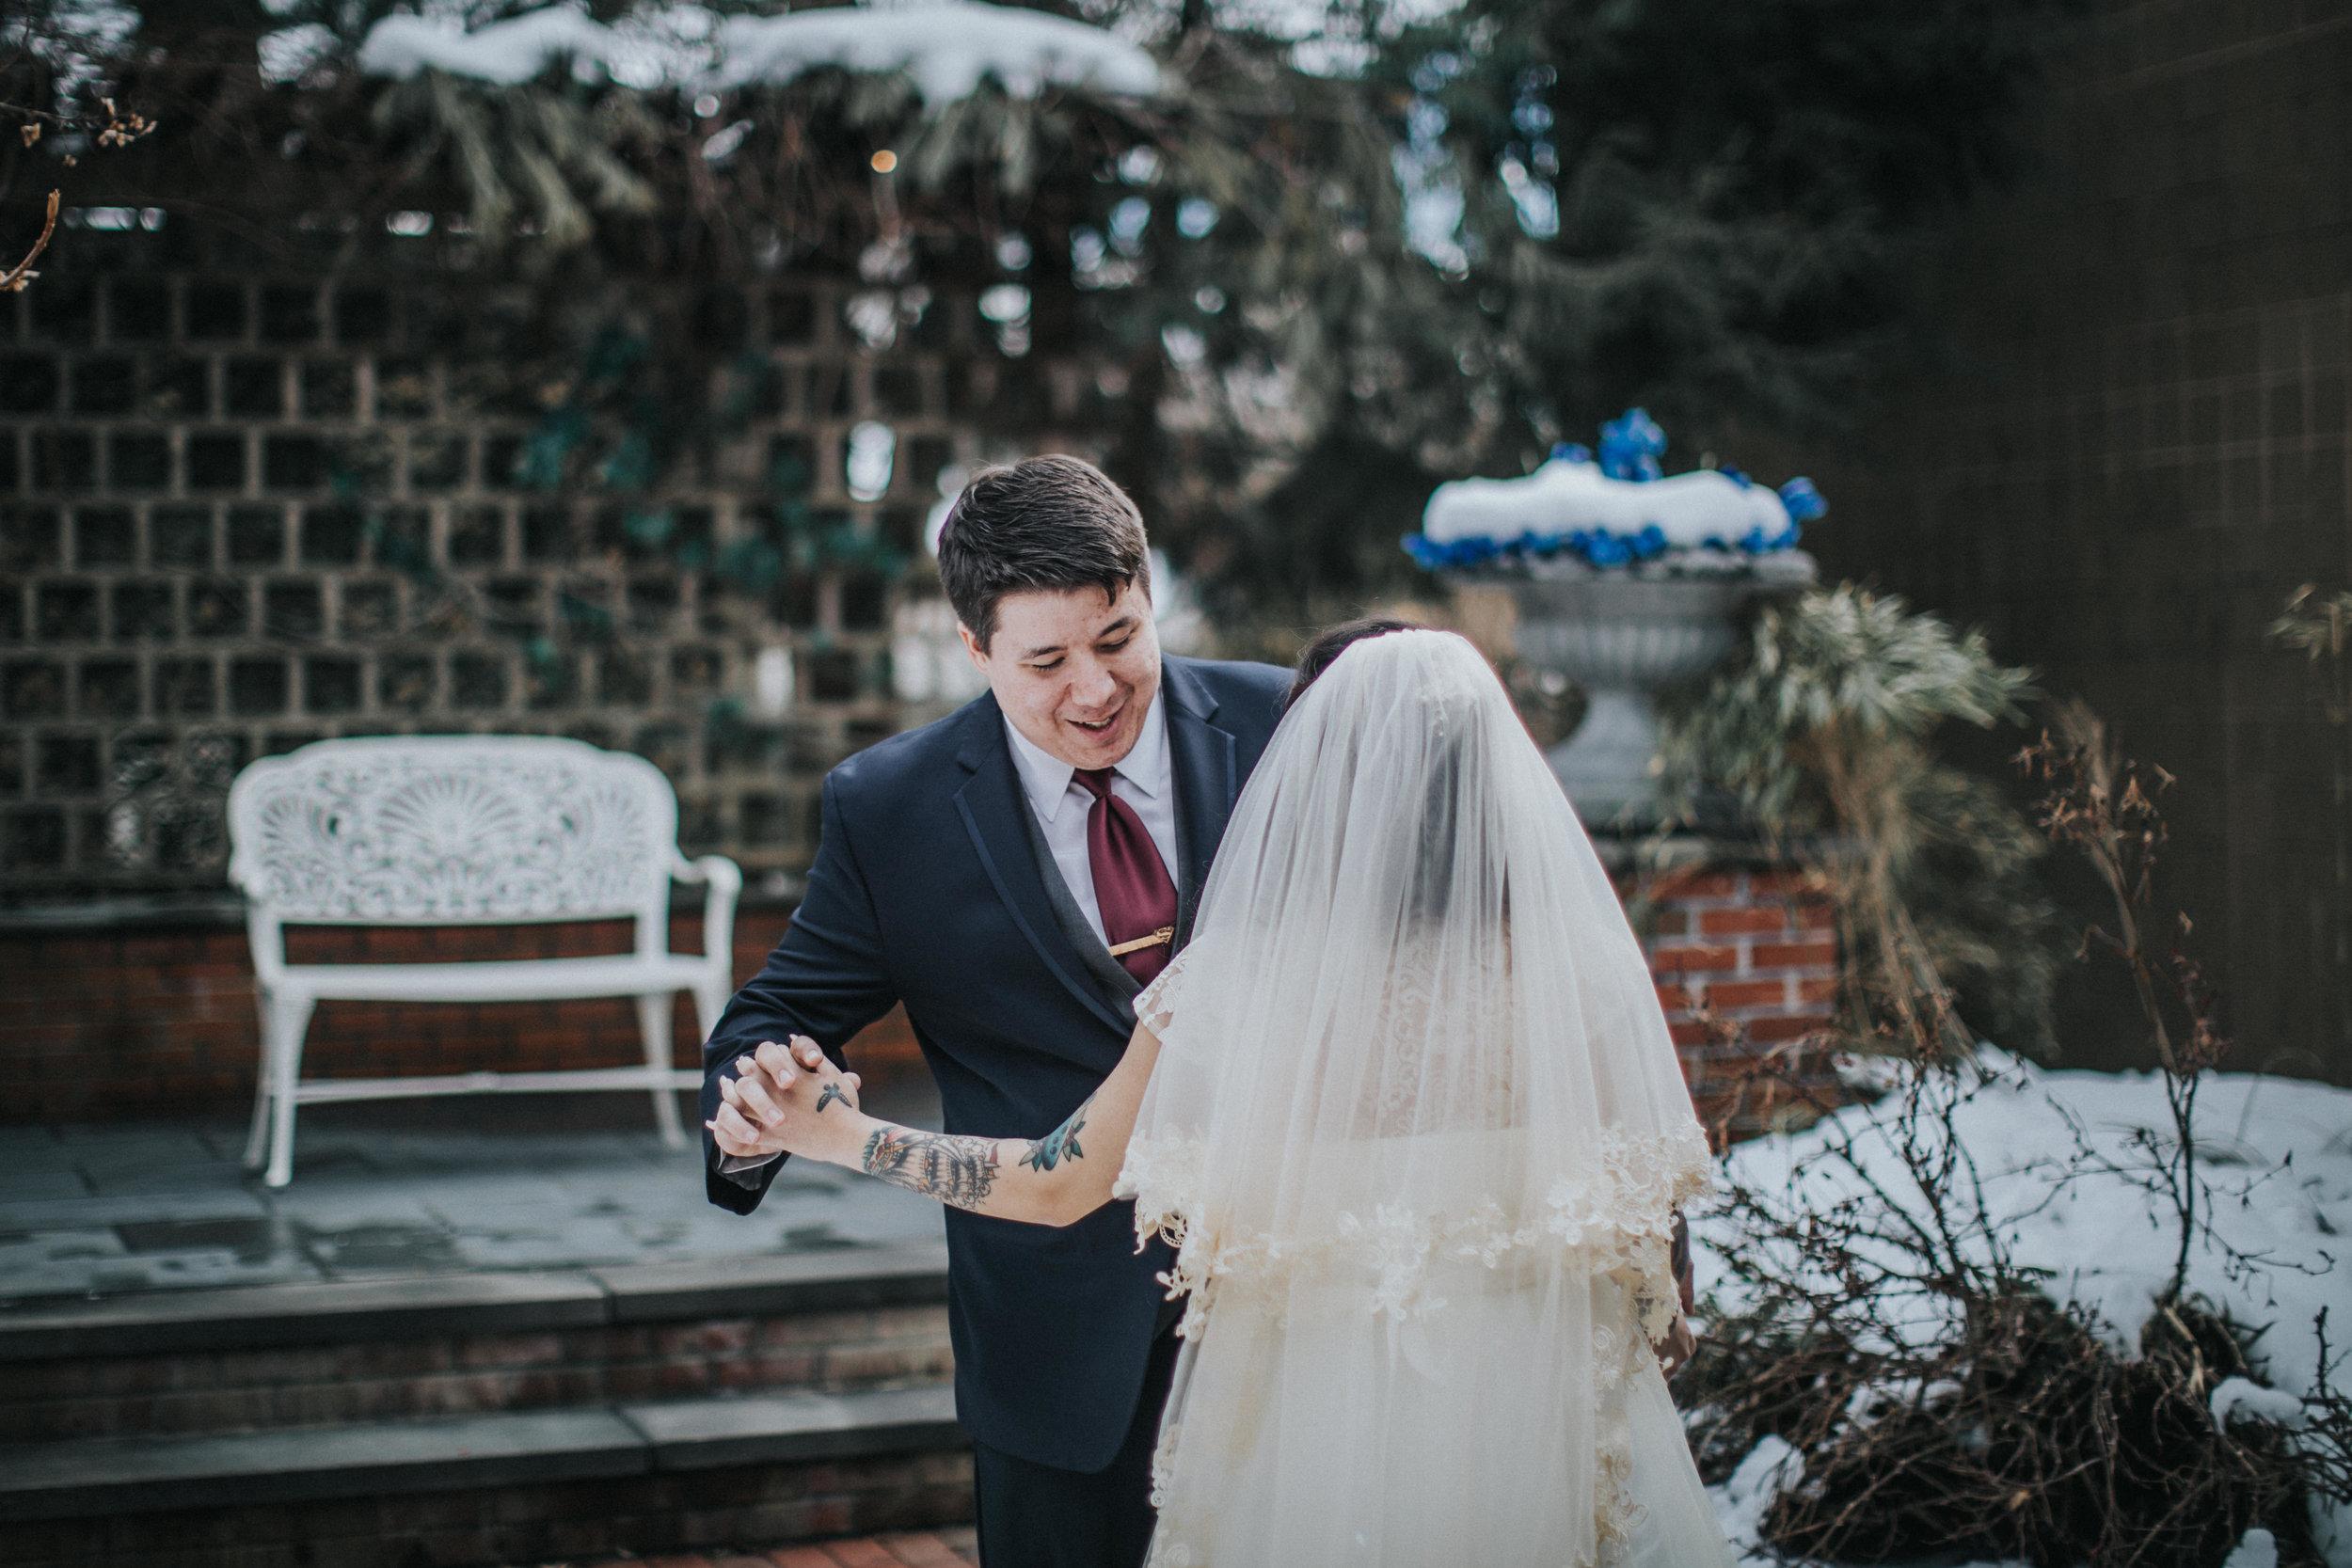 New-Jersey-Wedding-Photographer-ReceptionCenter-Valeria&Mike-First-Look-Bride&Groom (9 of 69).jpg